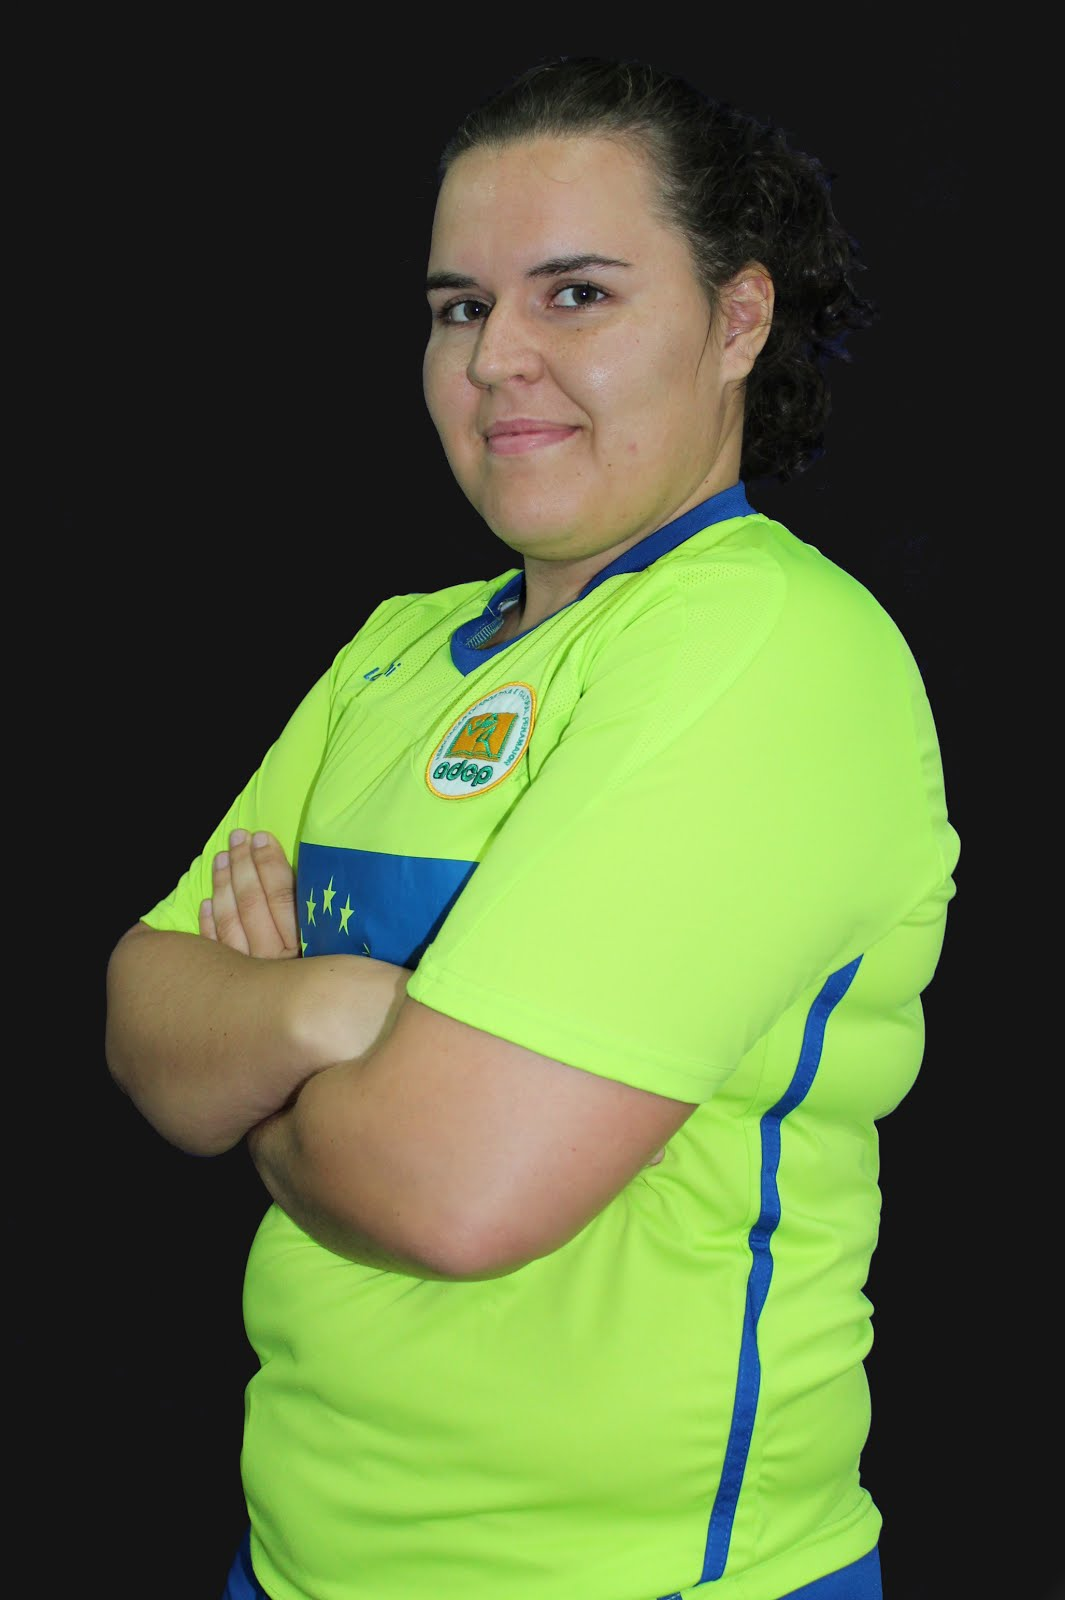 3 - Sara Castro